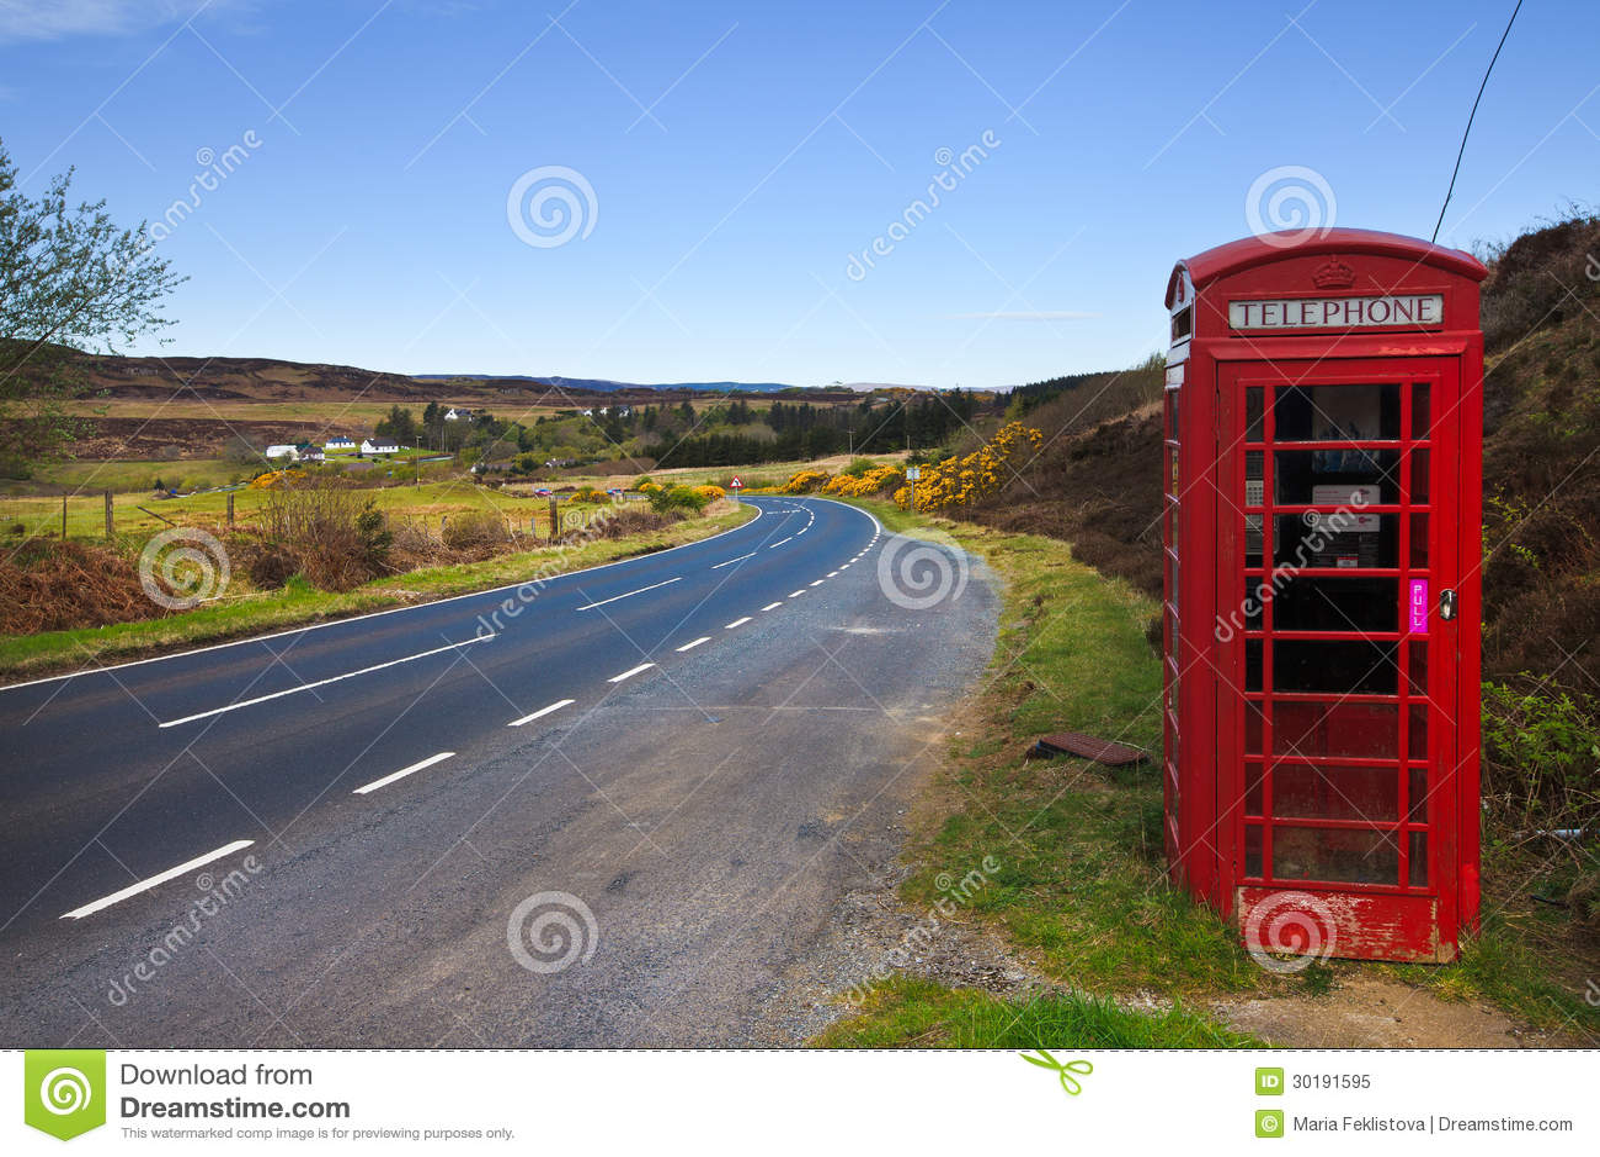 Communication is everywhere, Isle of Skye, UK